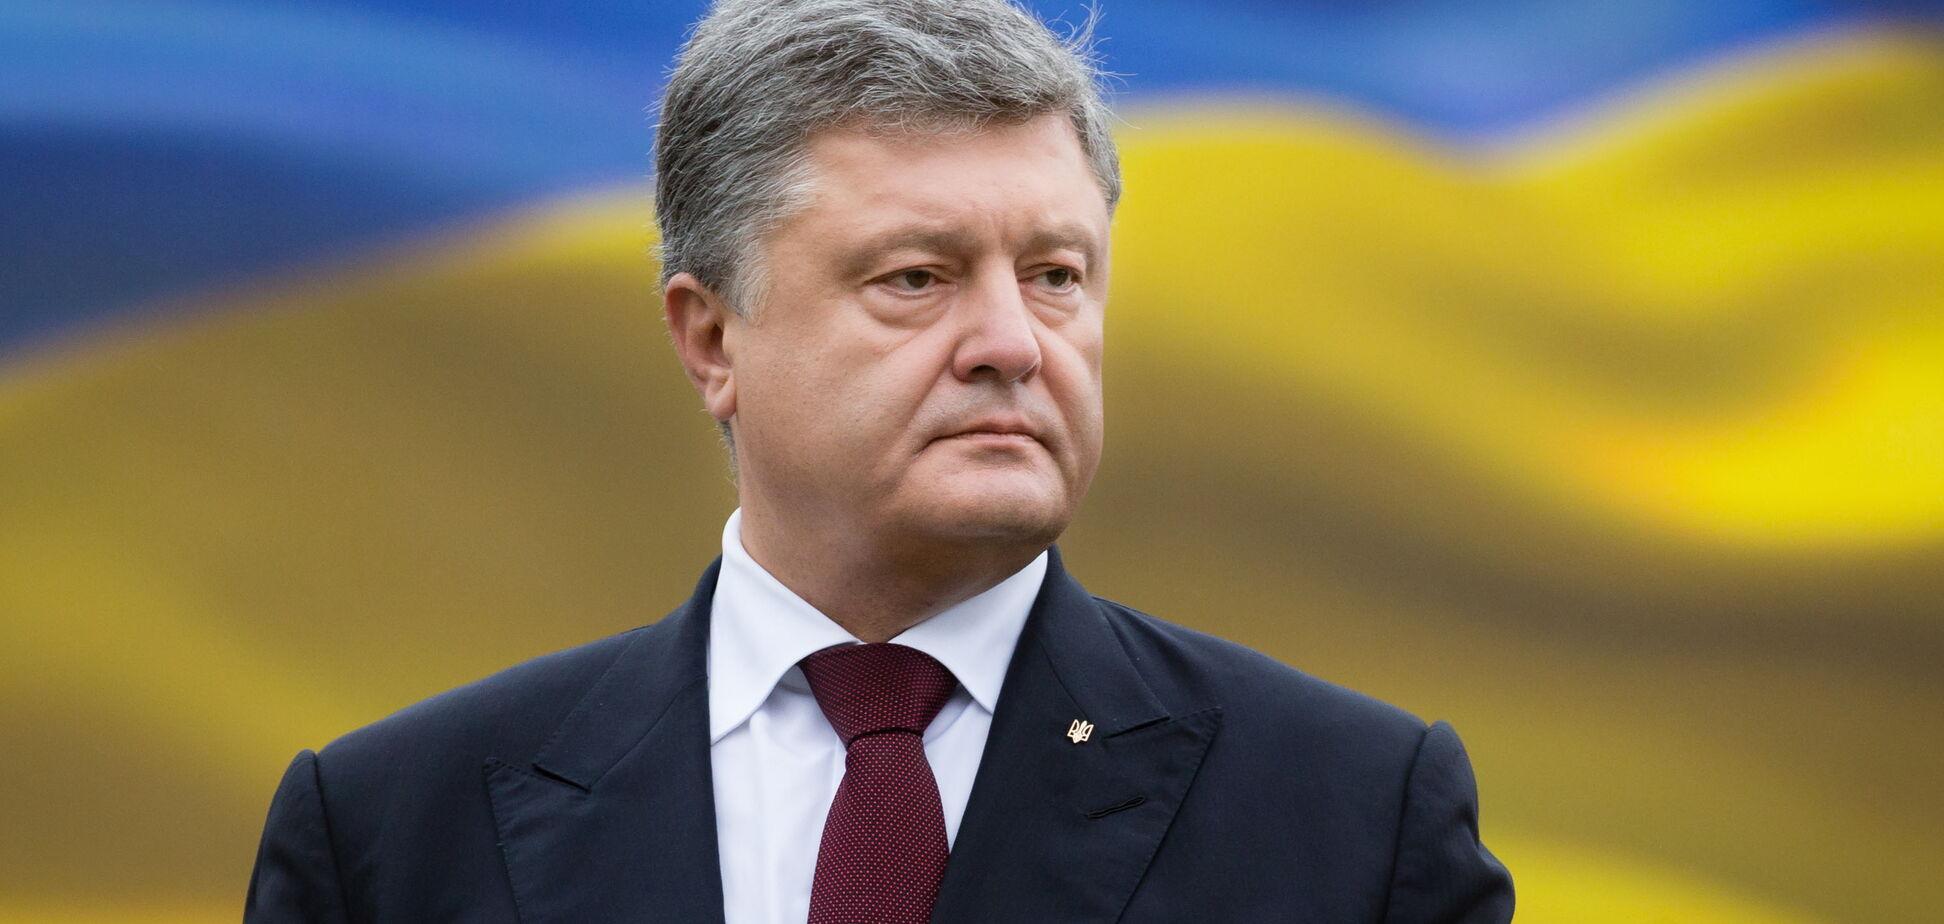 Трезубу не место на земле: на встрече Порошенко и главы Австрии случился конфуз